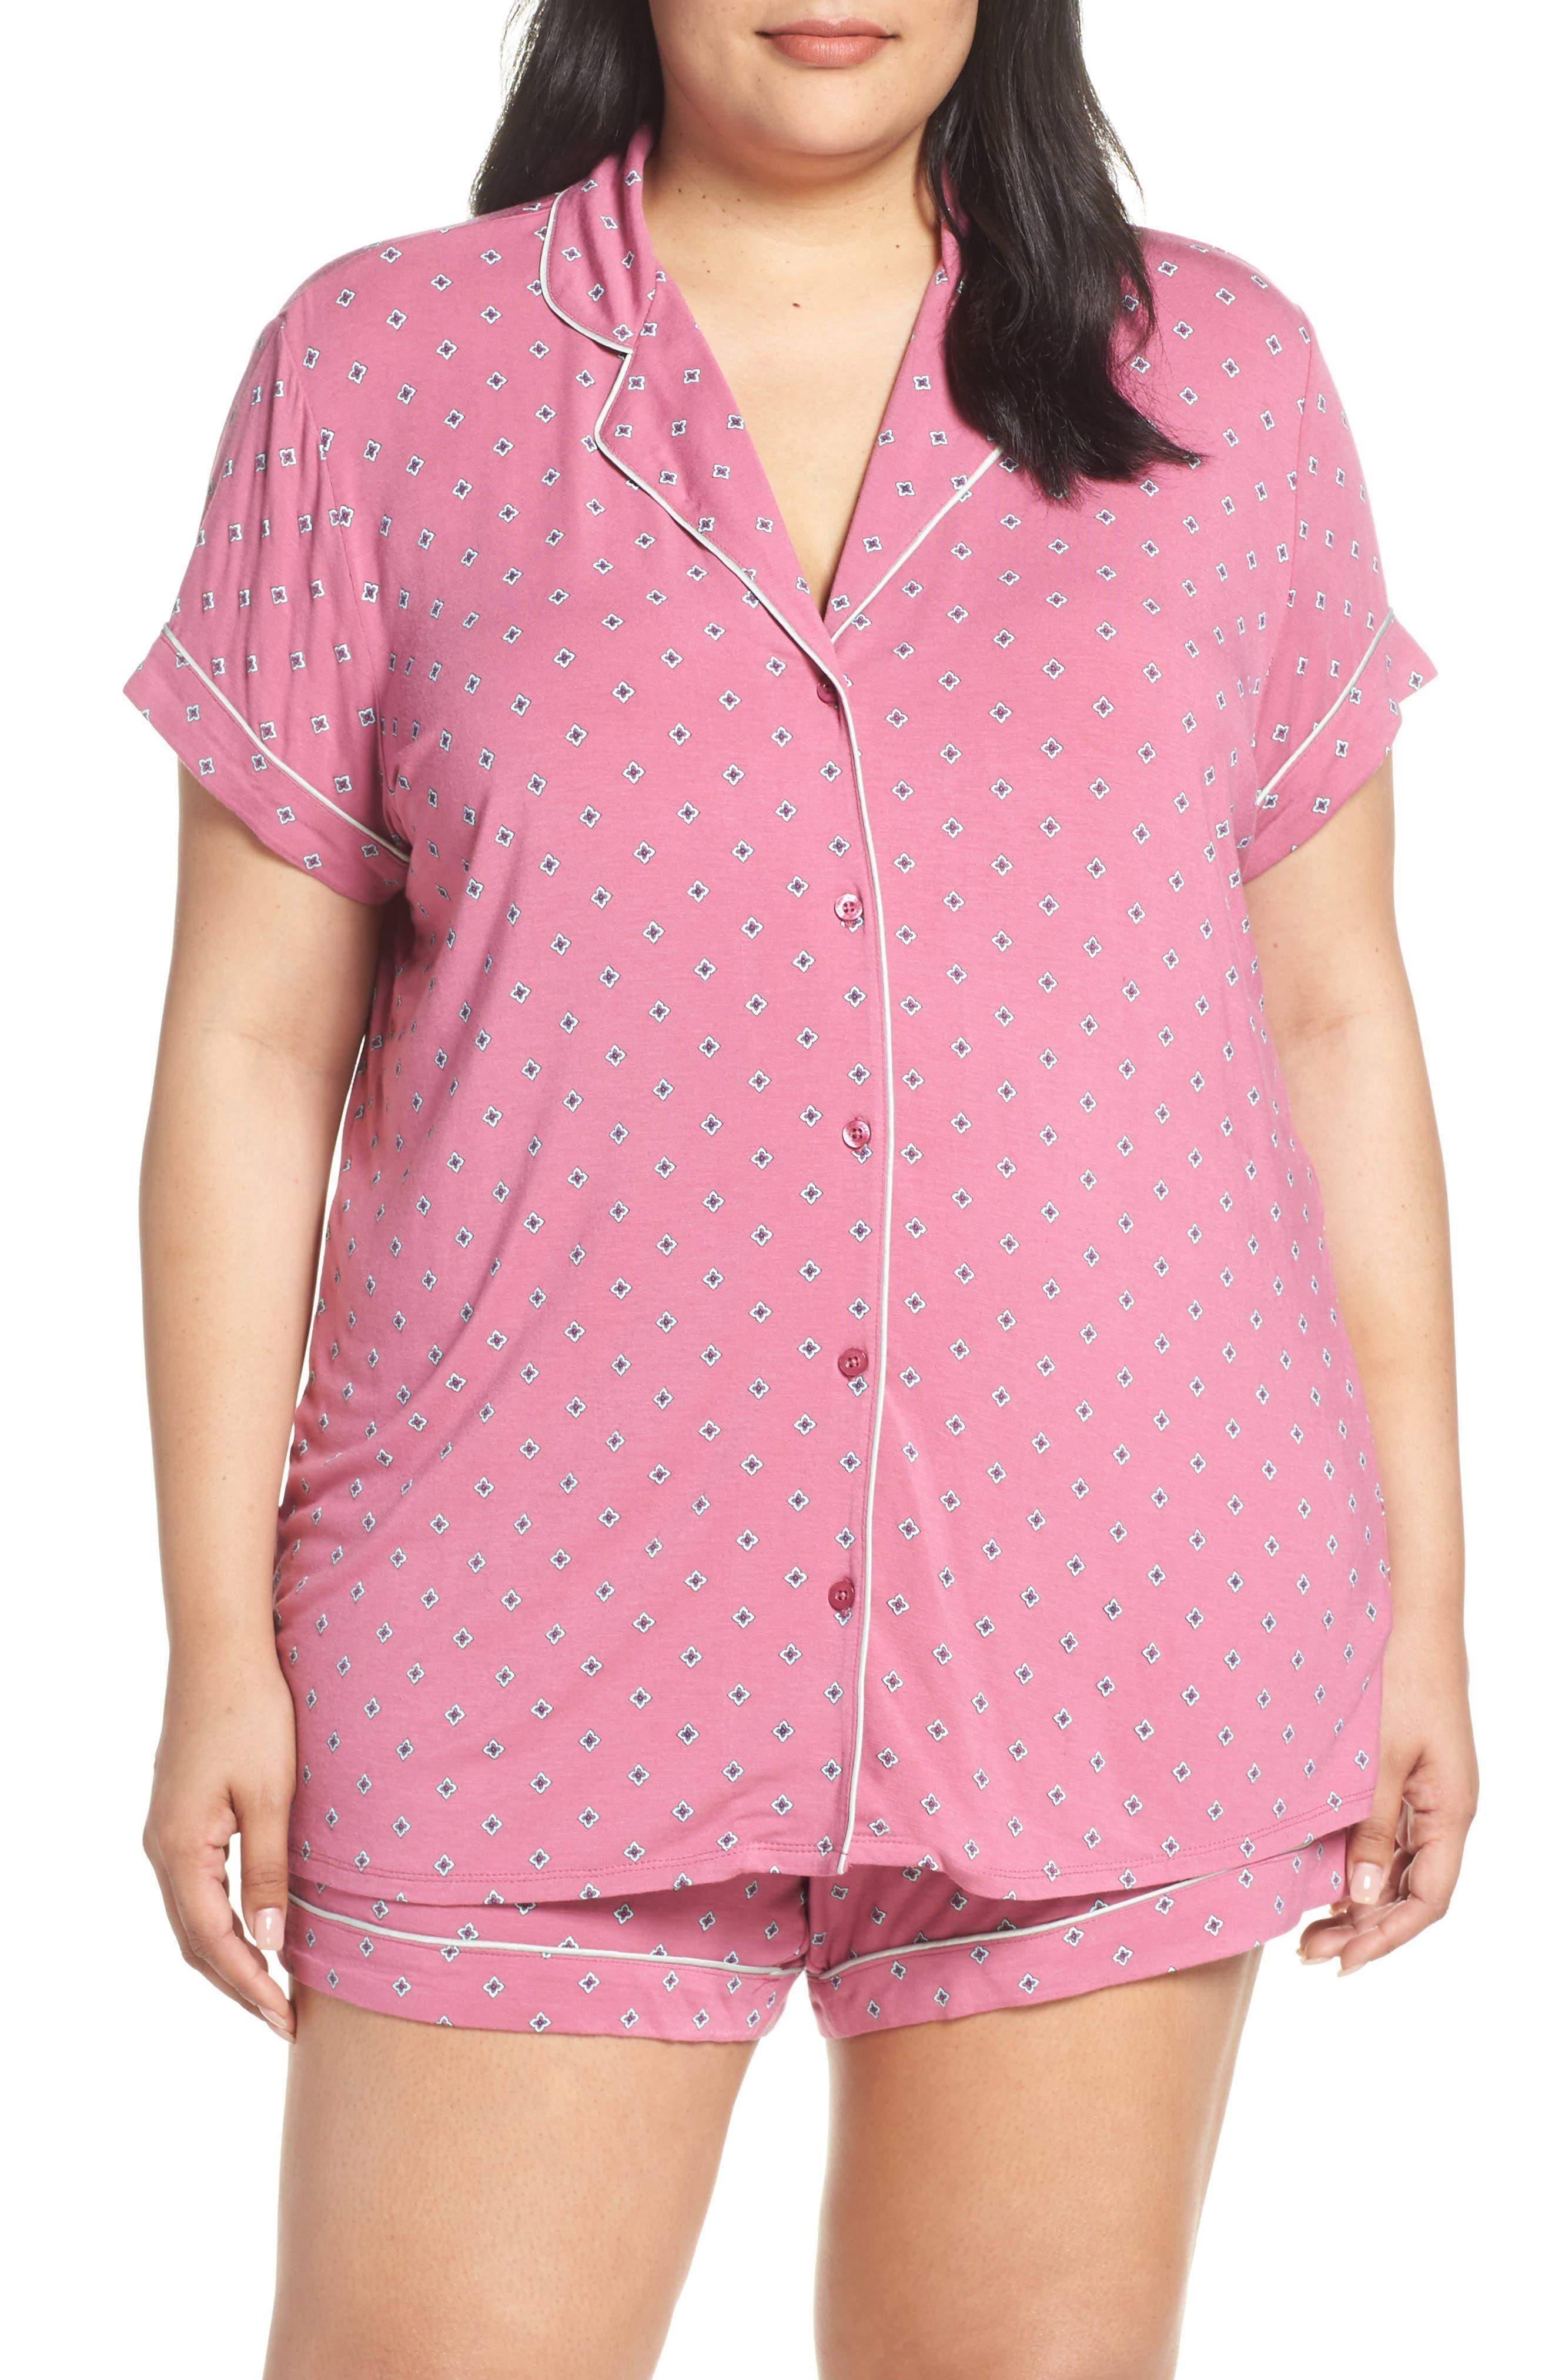 Plus Size Nordstrom Lingerie Moonlight Short Pajamas, Pink